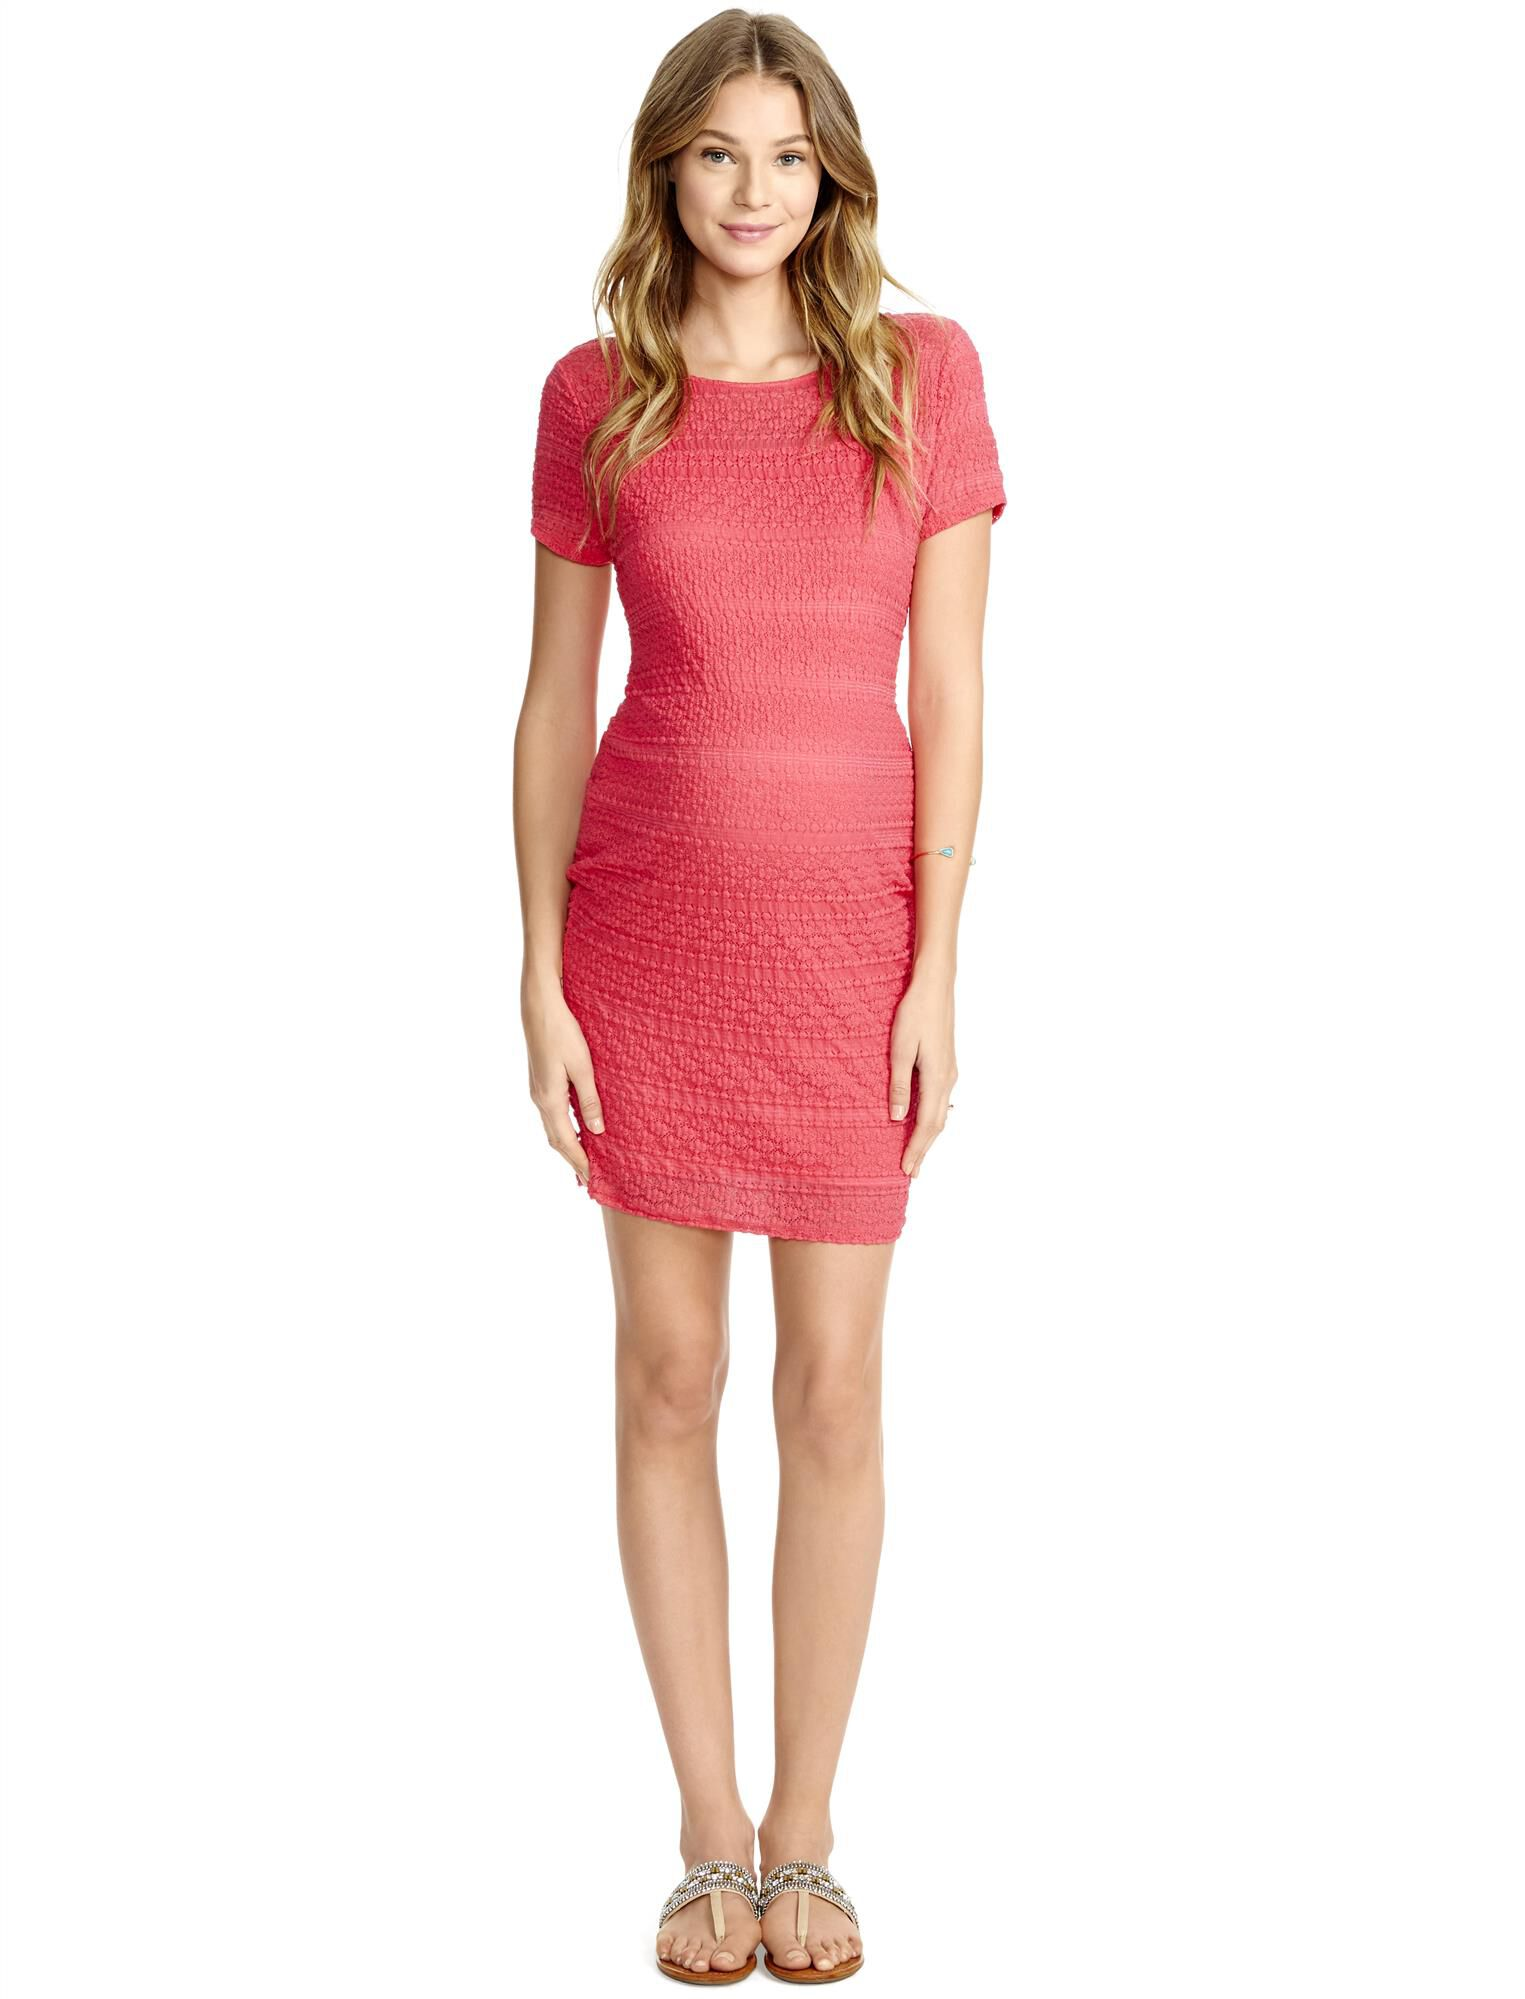 Jessica Simpson Lace Bodycon Maternity Dress- Coral